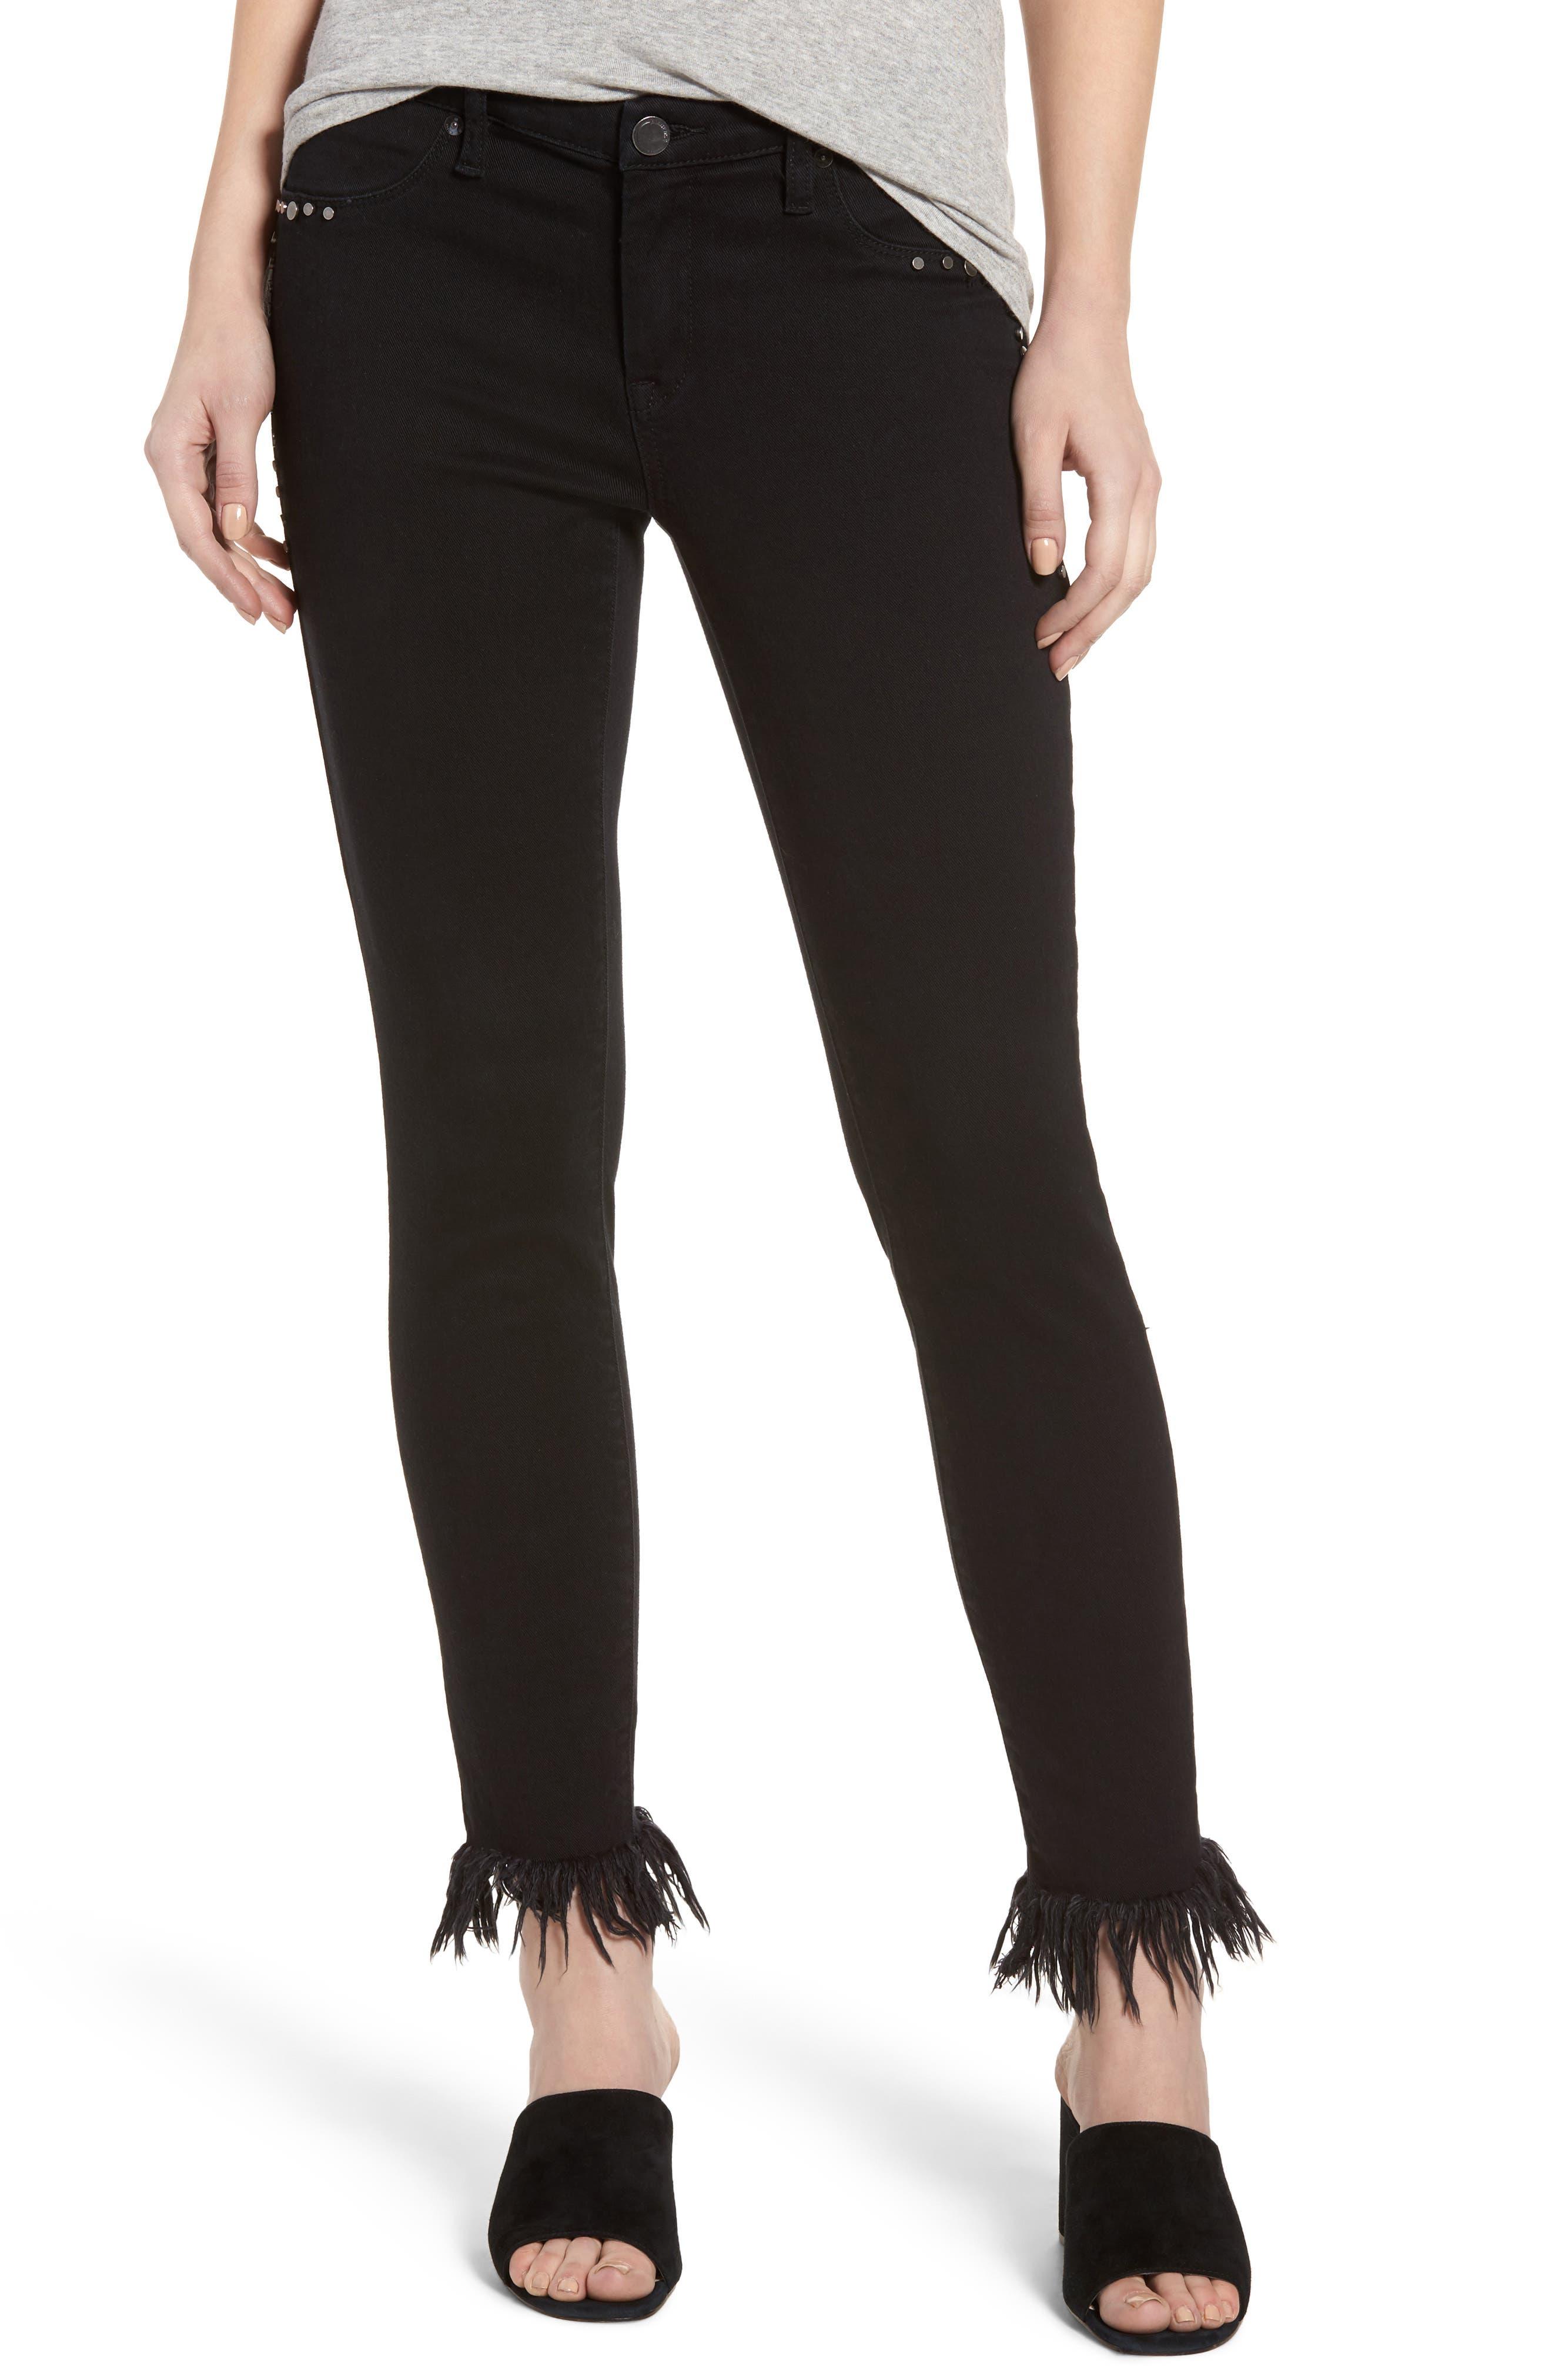 Embroidered & Studded Skinny Jeans,                         Main,                         color, Hidden Talent Black